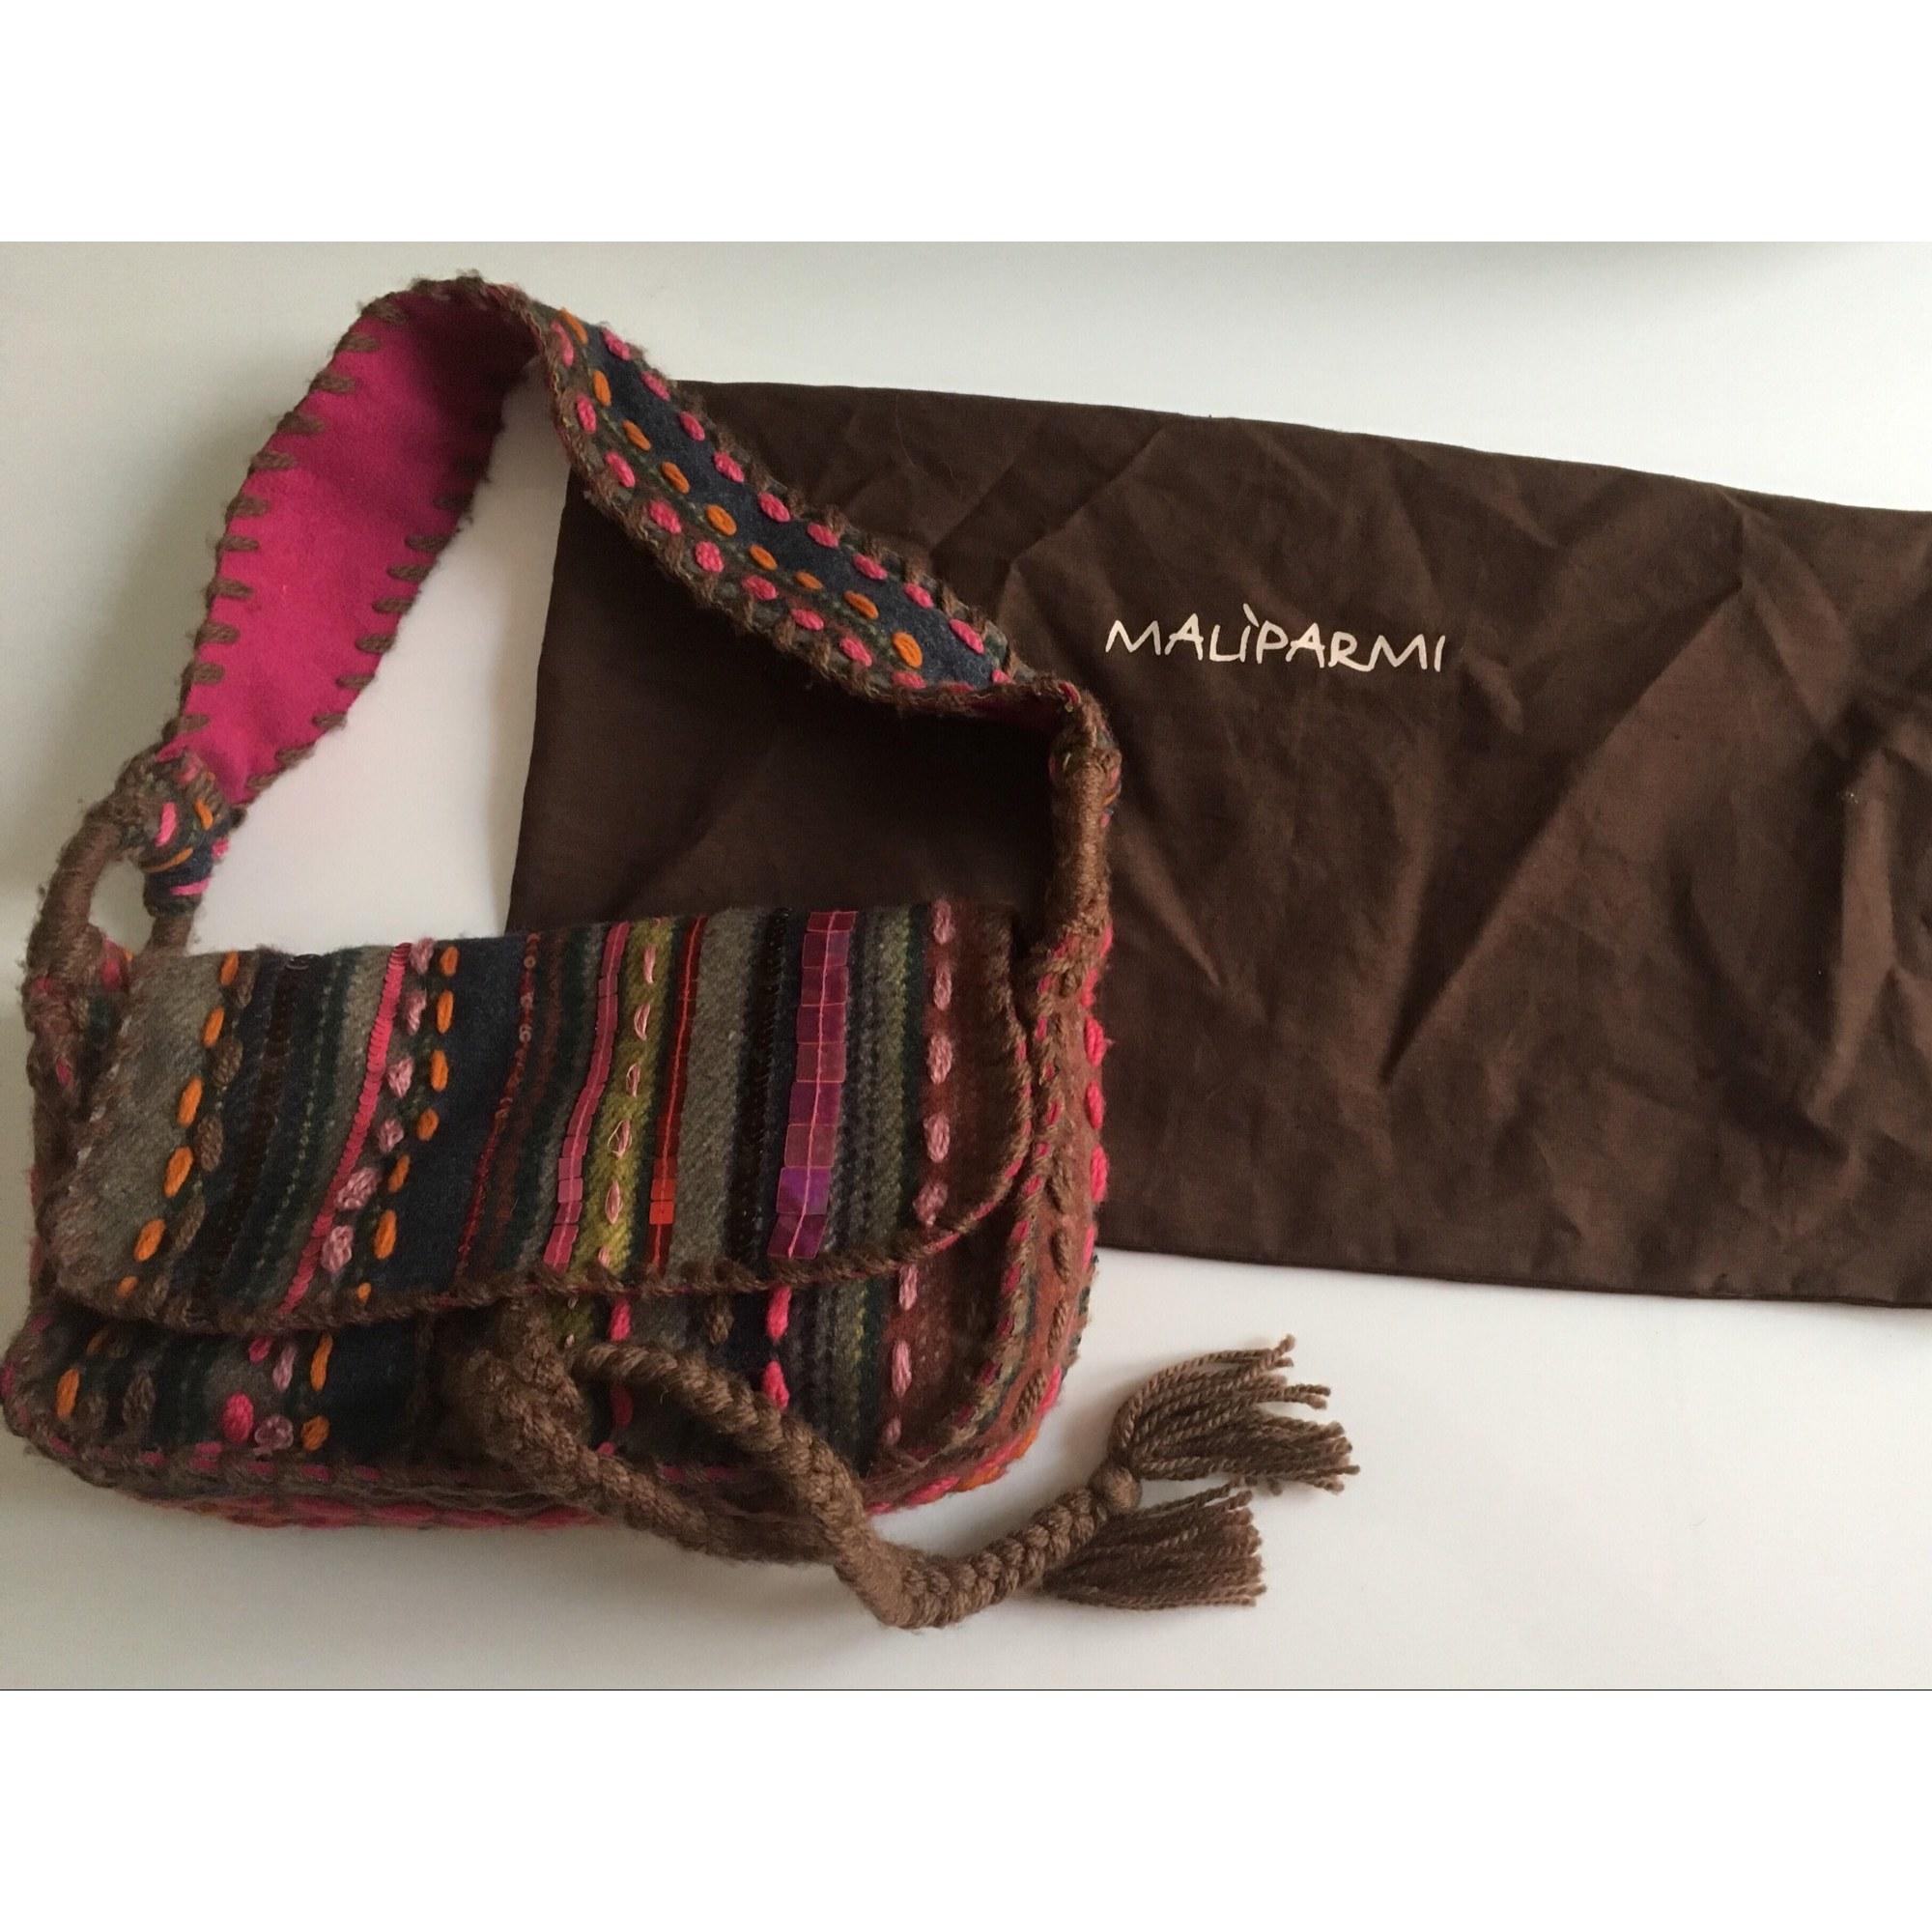 Sac à main en tissu MALIPARMI laine multicolore